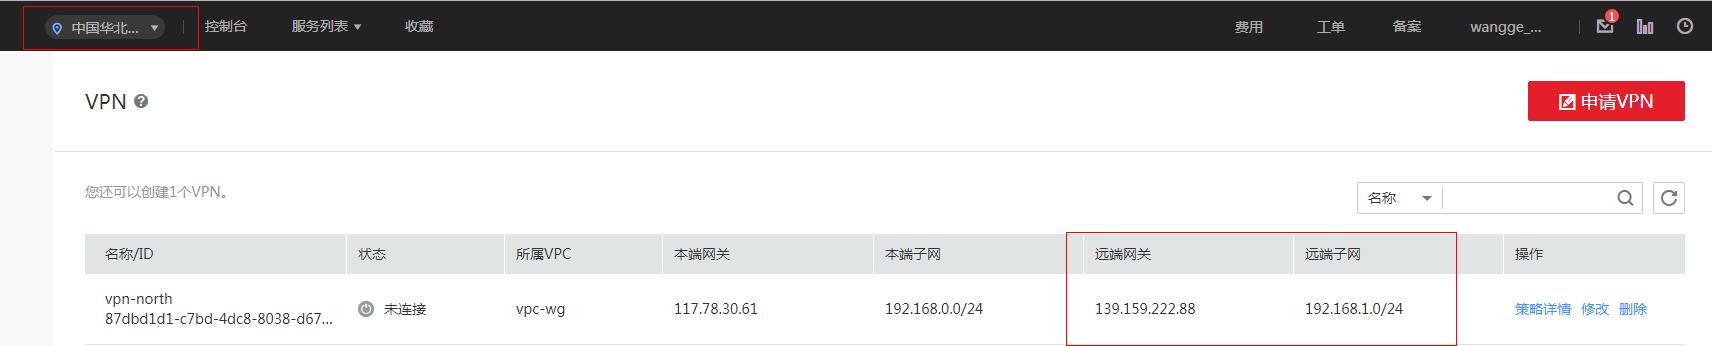 更新华北区vpn.png